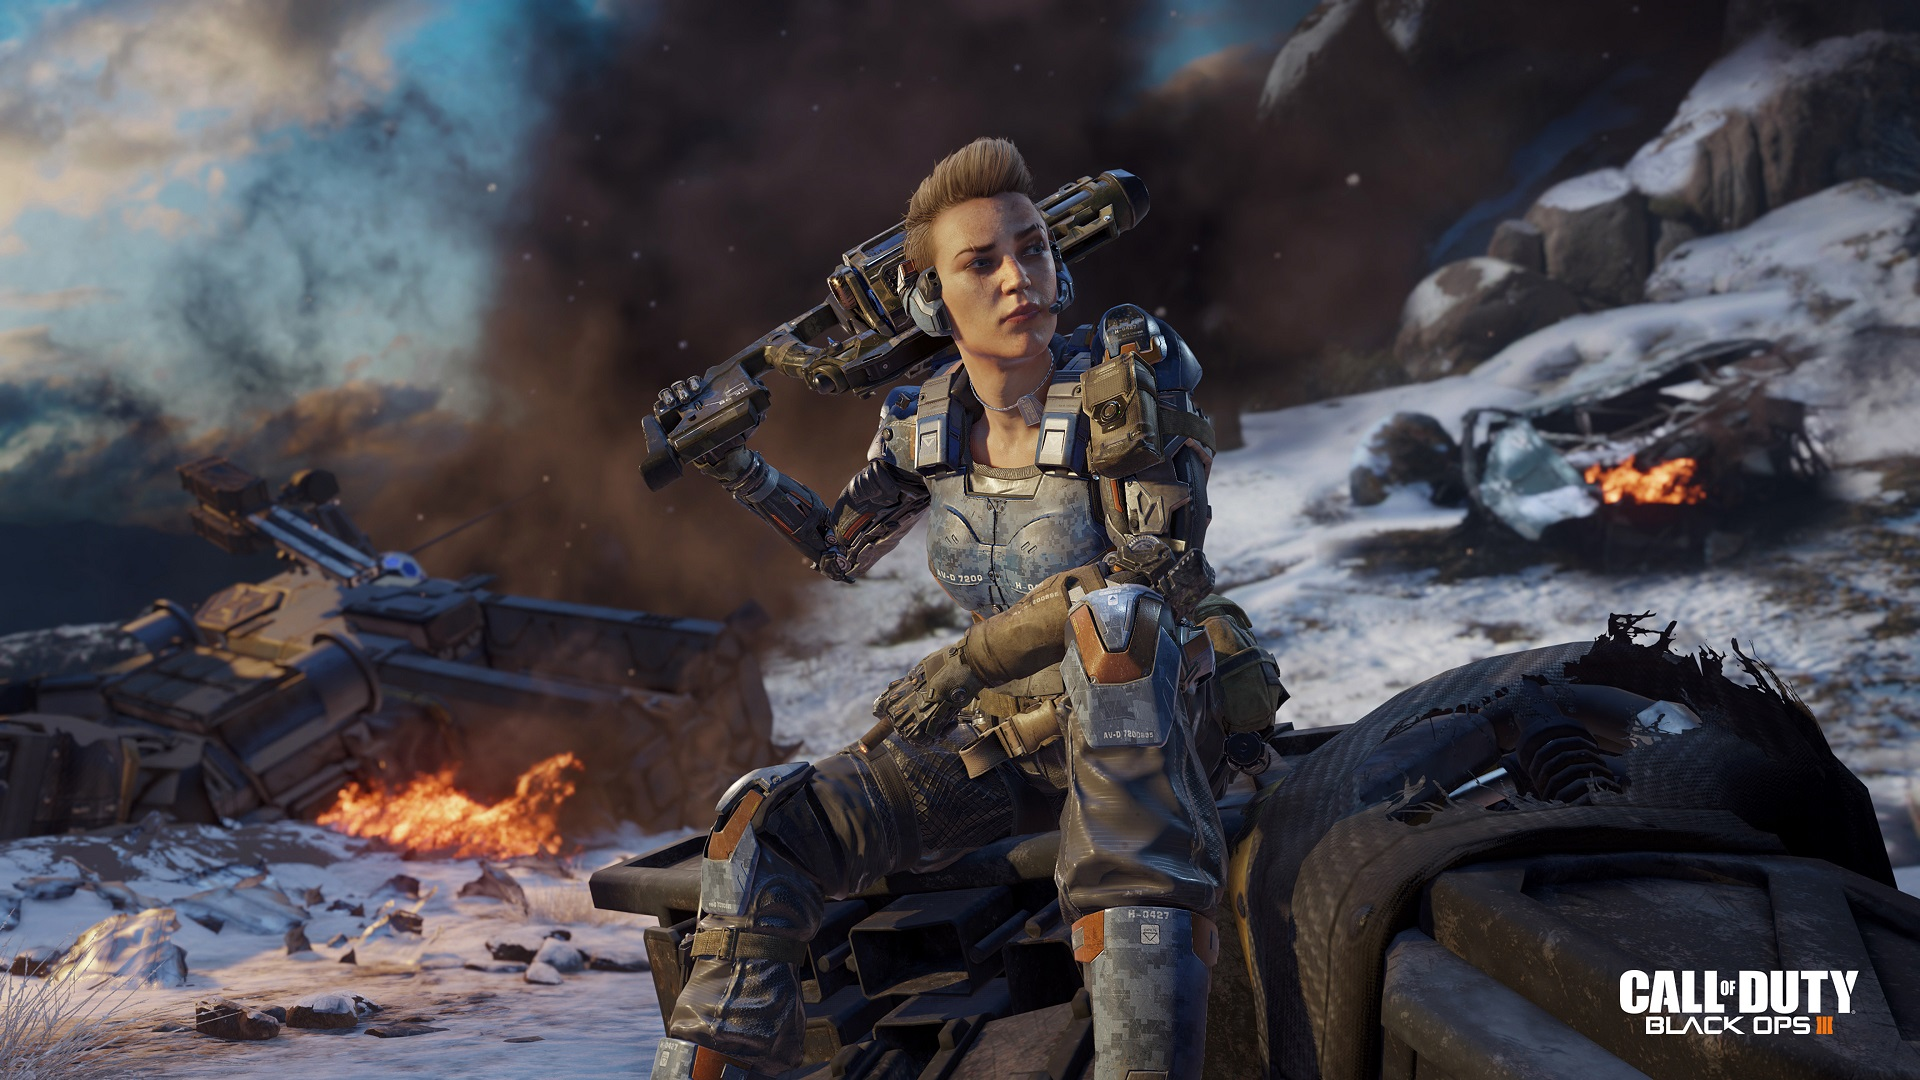 Black Ops 3 is a bonus free game on PlayStation Plus screenshot